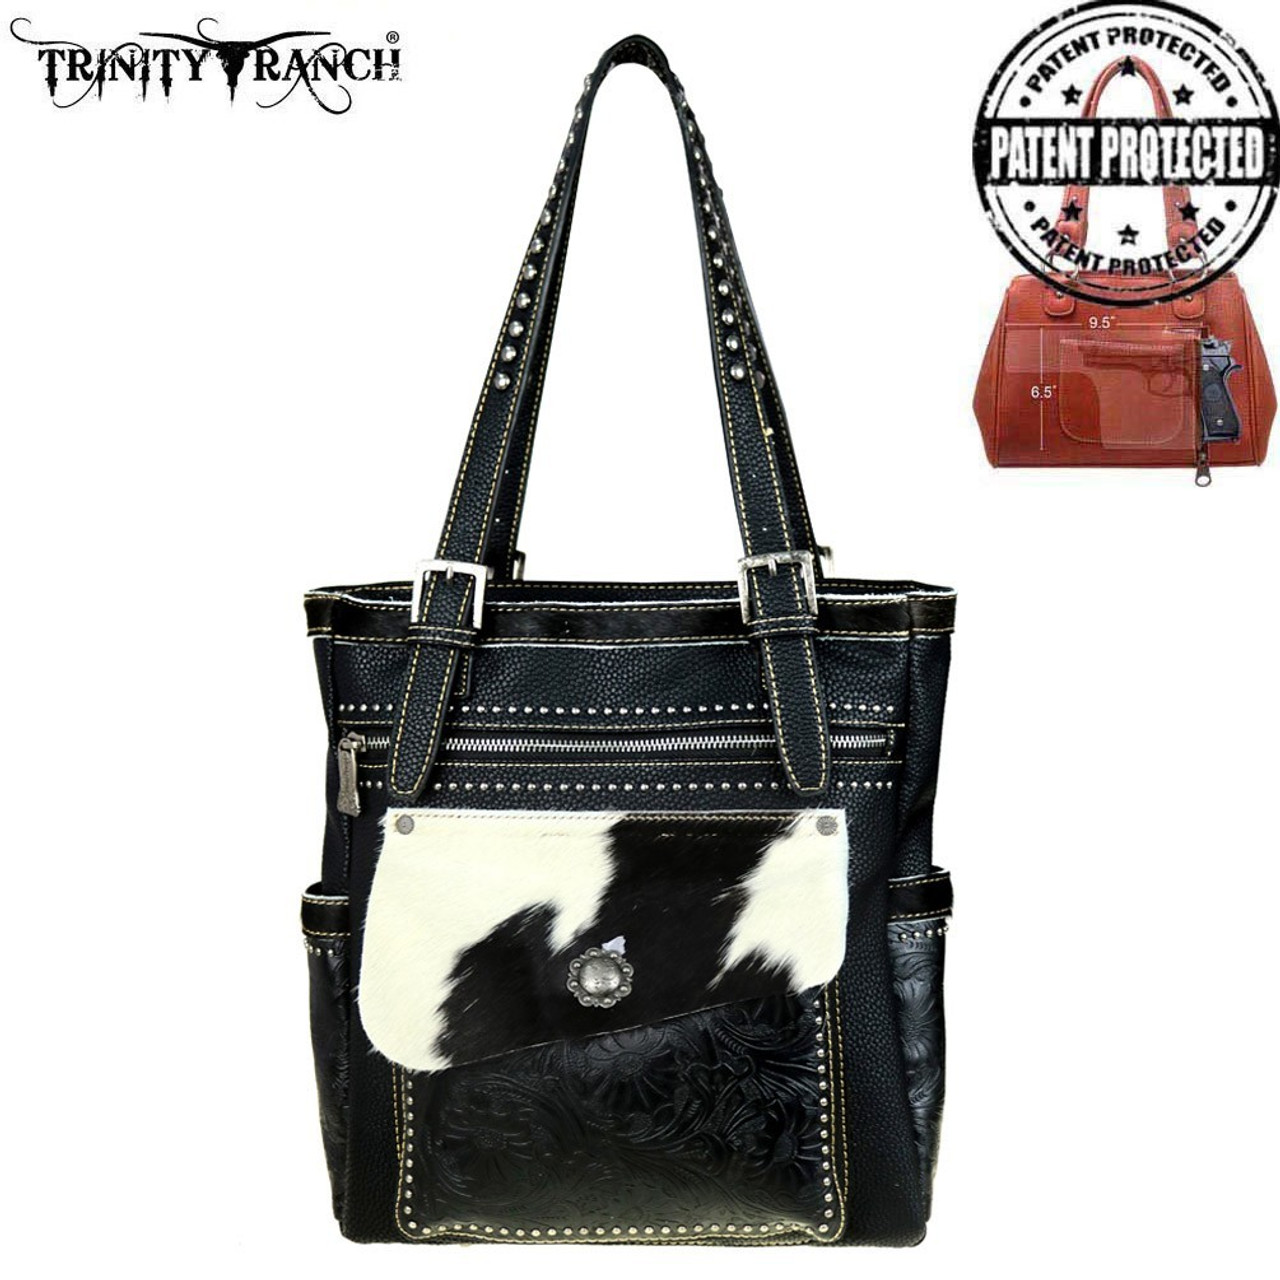 Montana West Trinity Ranch Silver Conchos /& Hair on Leather Hobo Handbag Purse